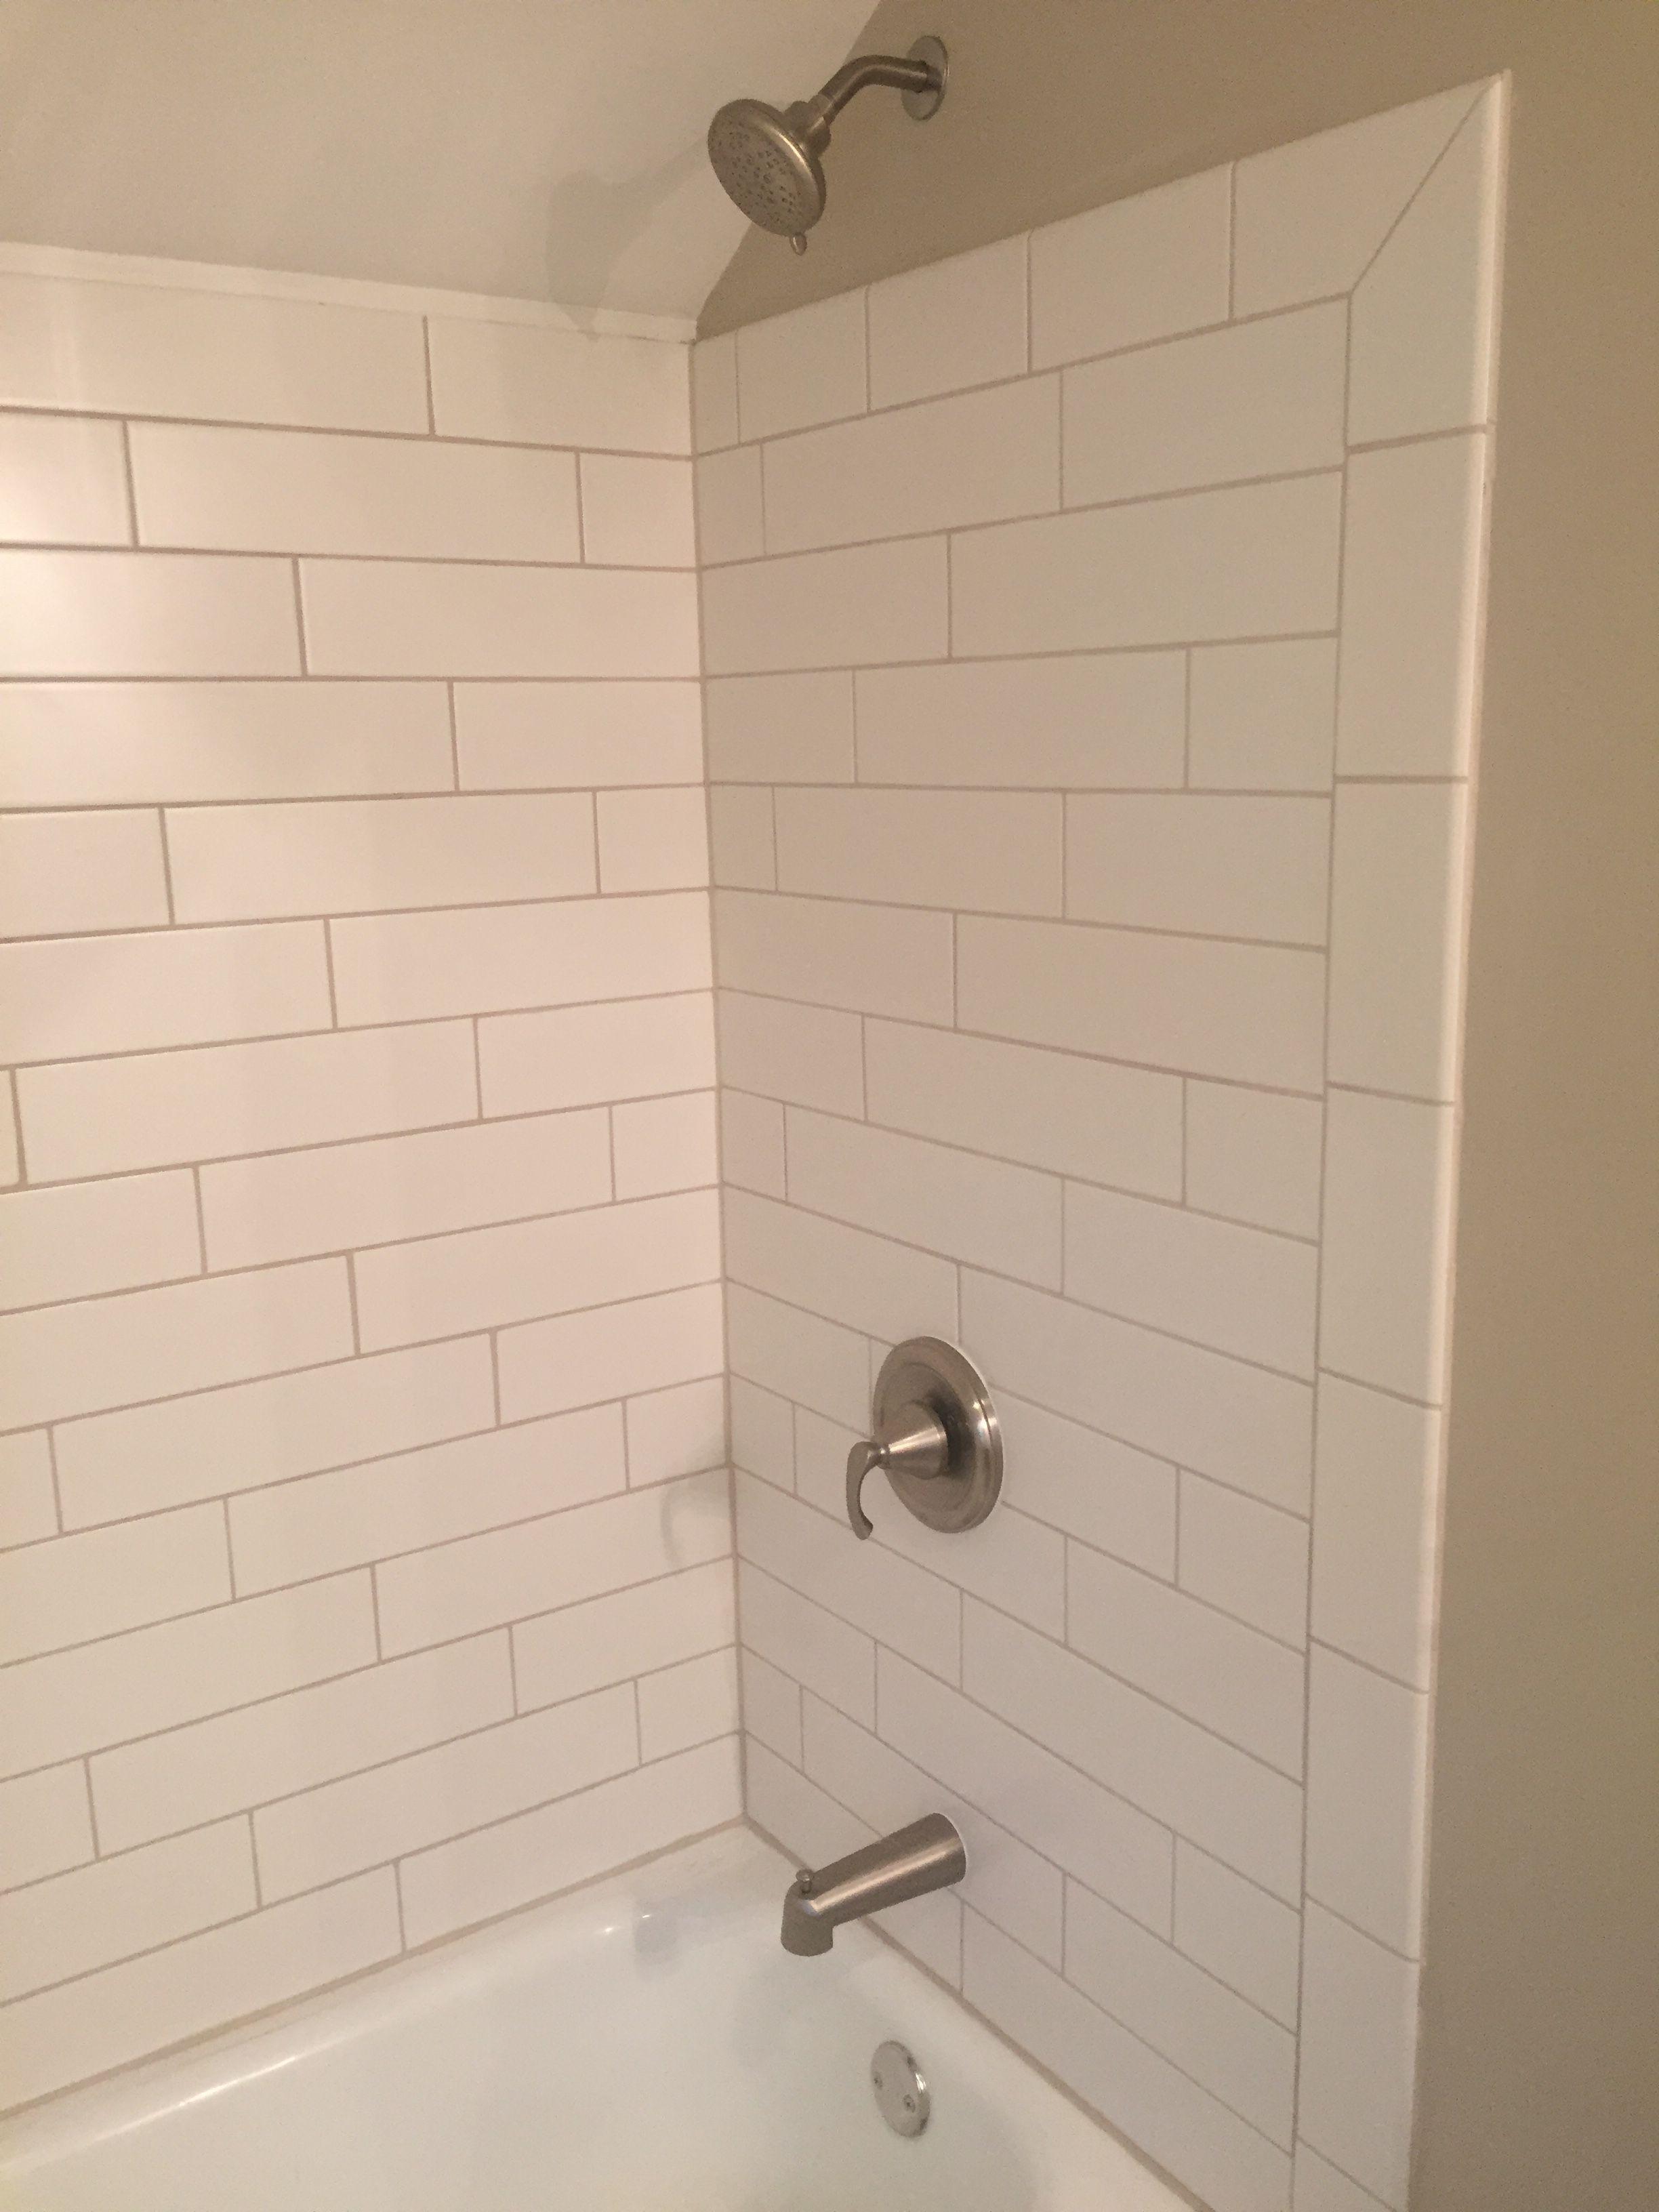 Large Subway Tile Expression Daylight 4 X16 Matte In The Main Bathroom White Bathroom Tiles Tile Bathroom Simple Bathroom